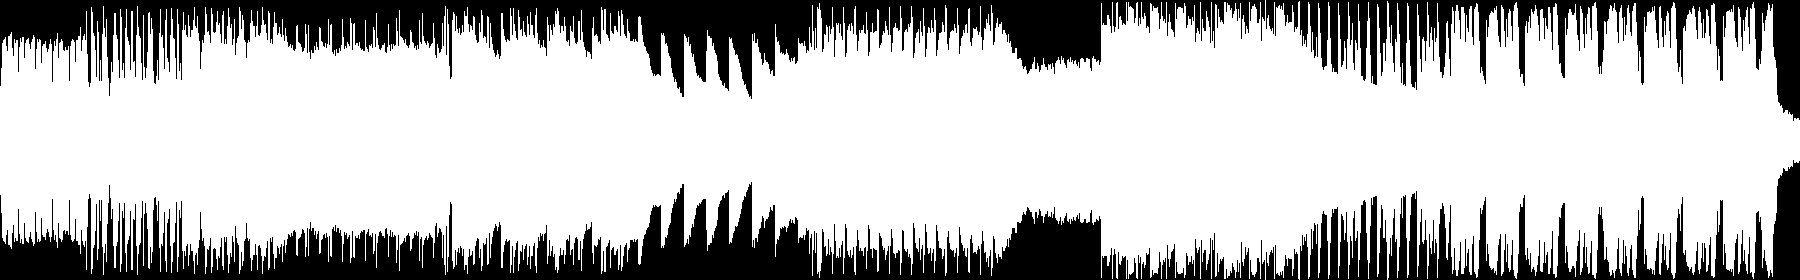 HORIZON - Future Soul audio waveform